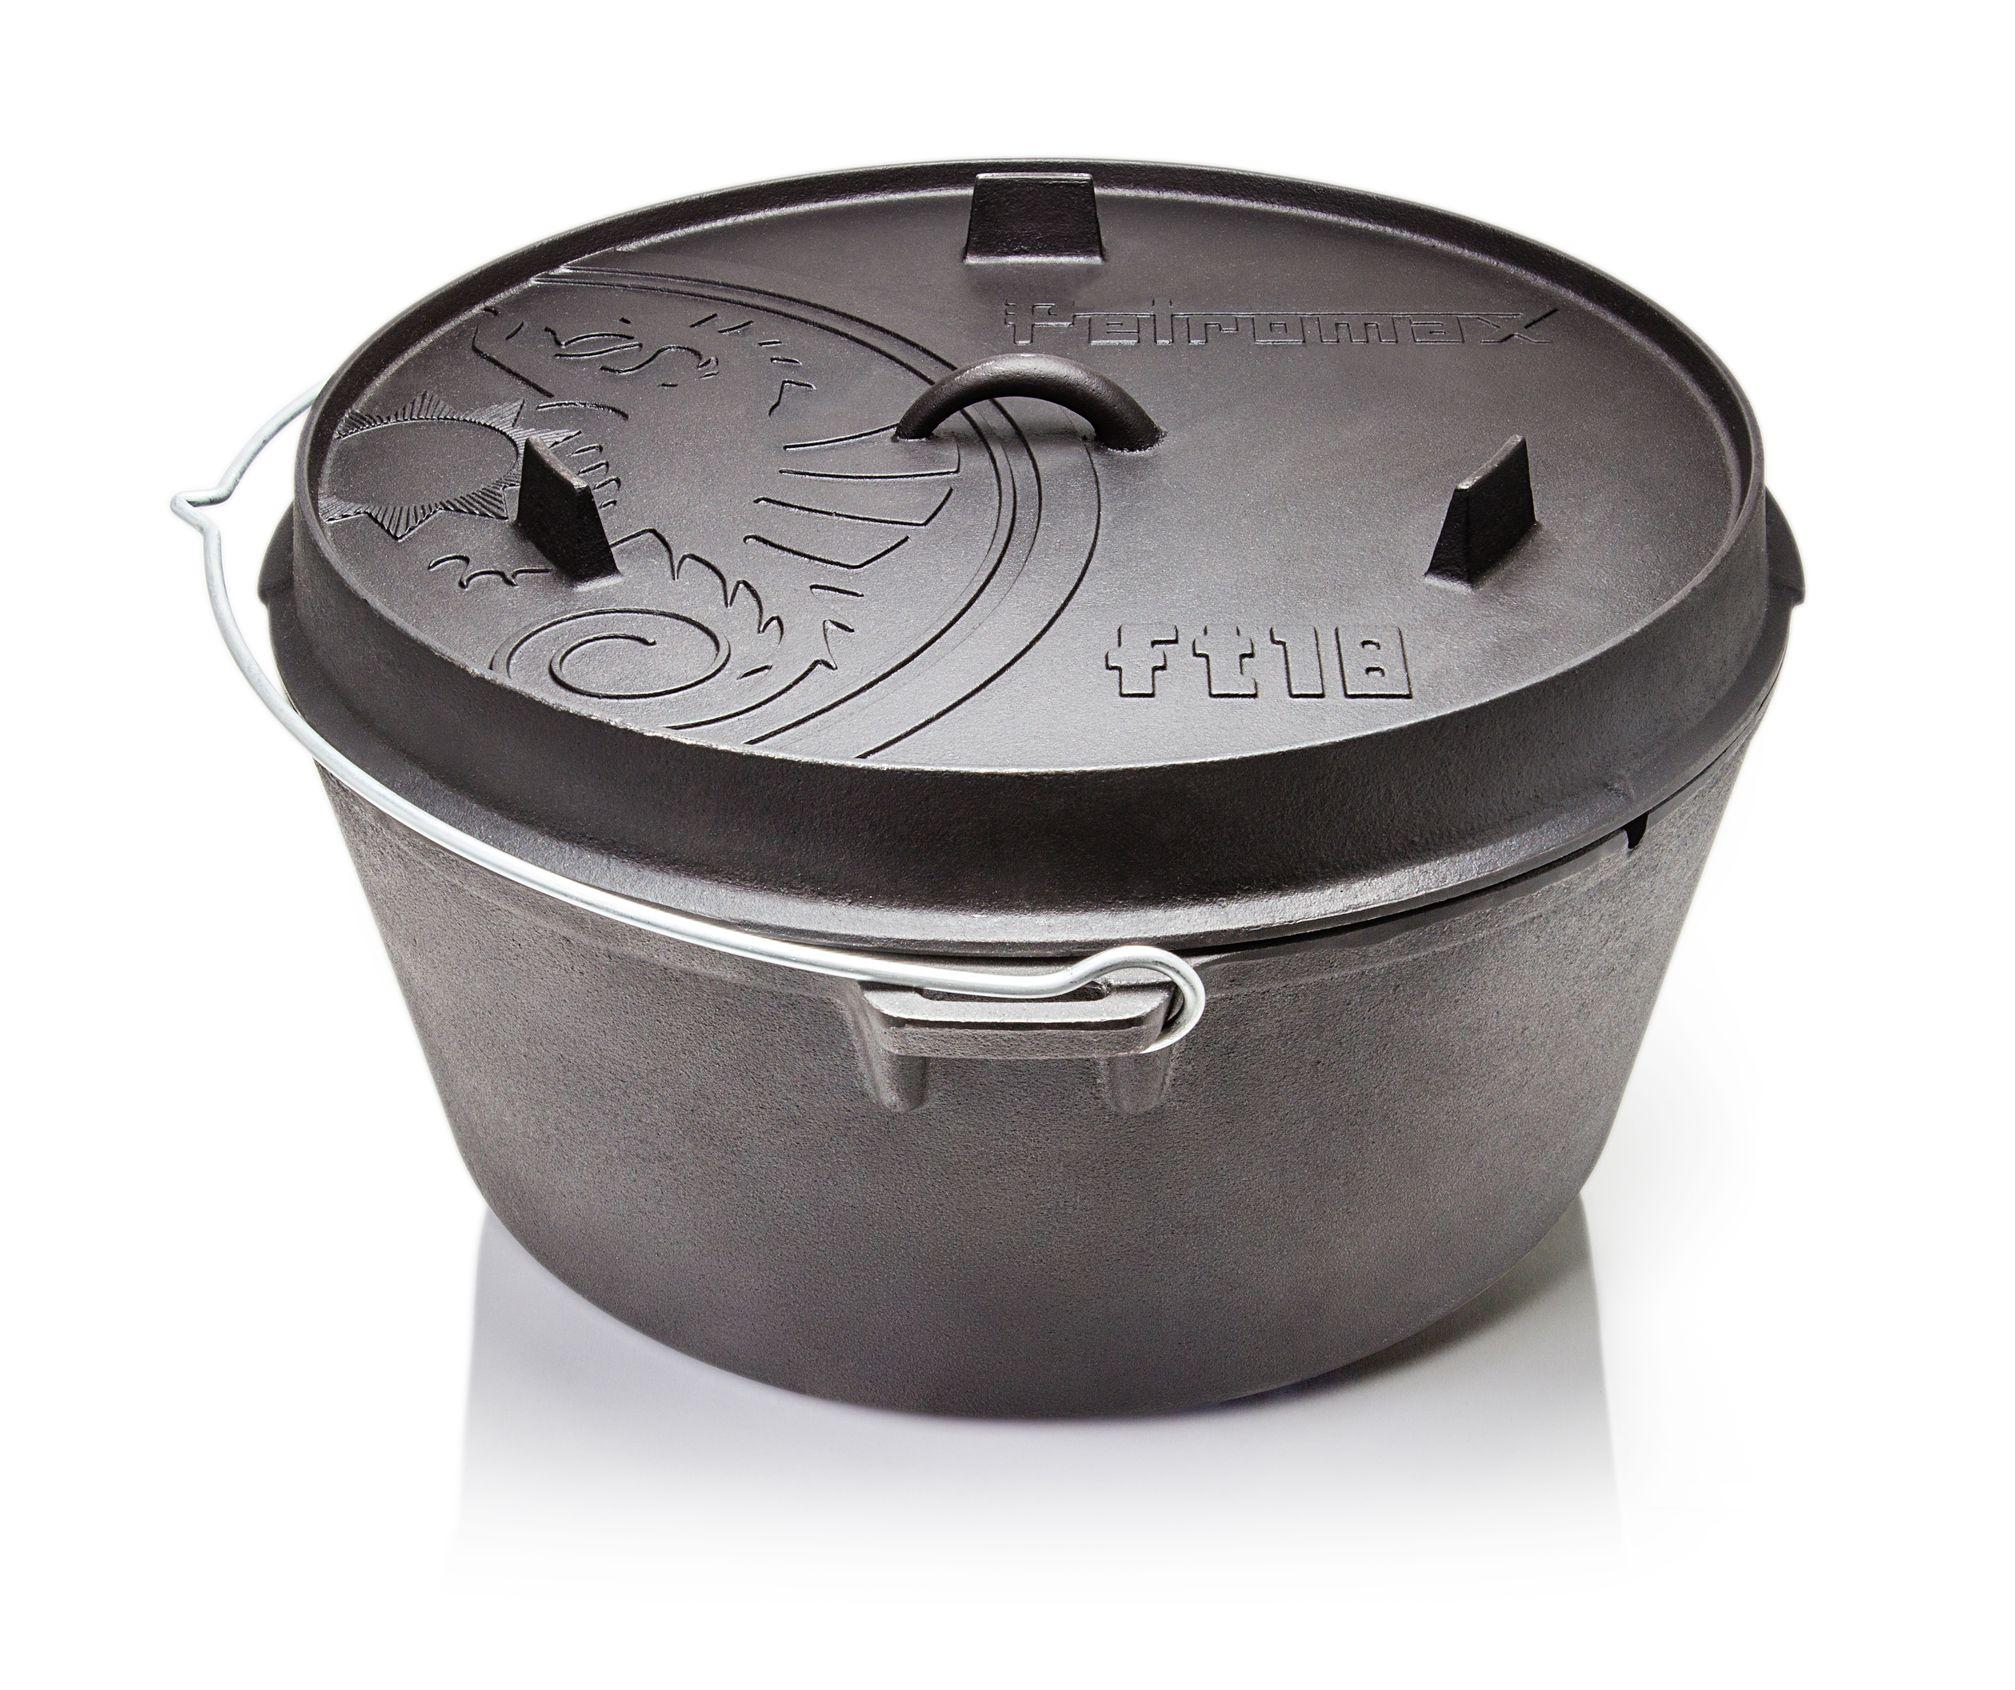 Petromax FT 3 Kochtopf Feuertopf Dutch Oven aus Gusseisen NEU mit Füsse